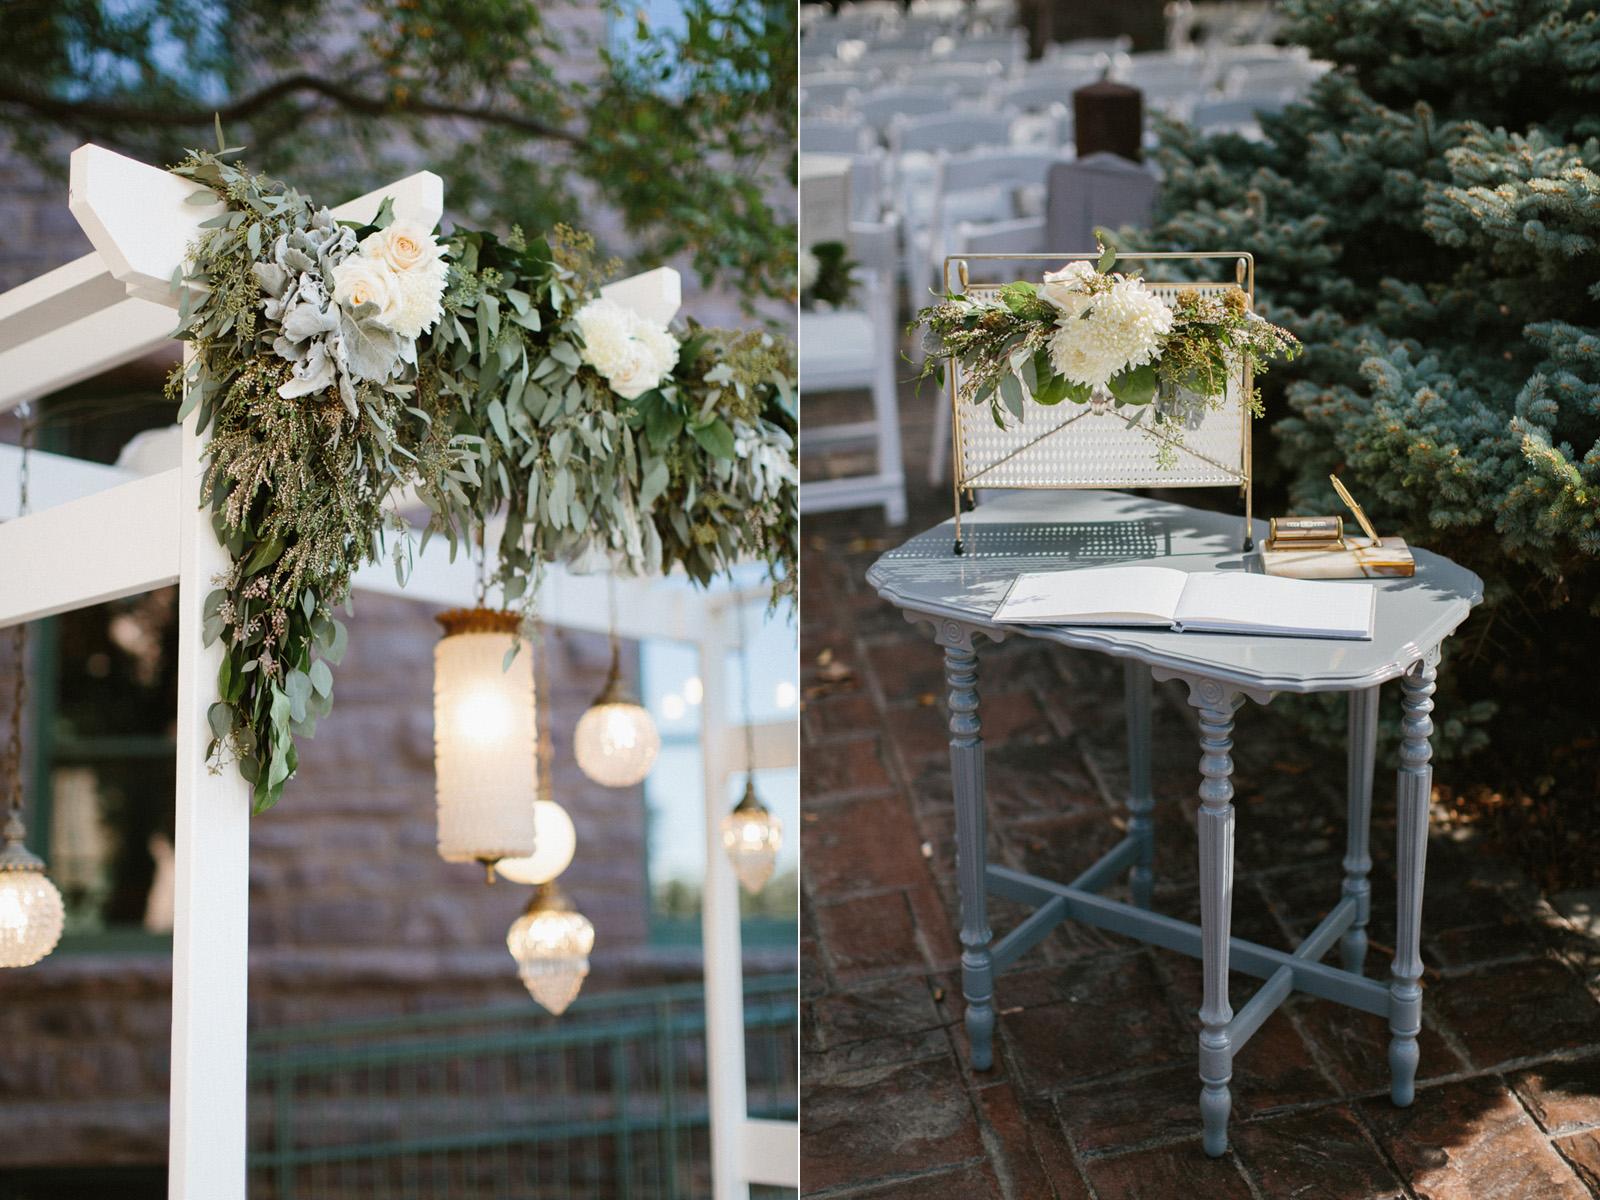 sioux_falls_desmoines_wedding_photographer_30.jpg